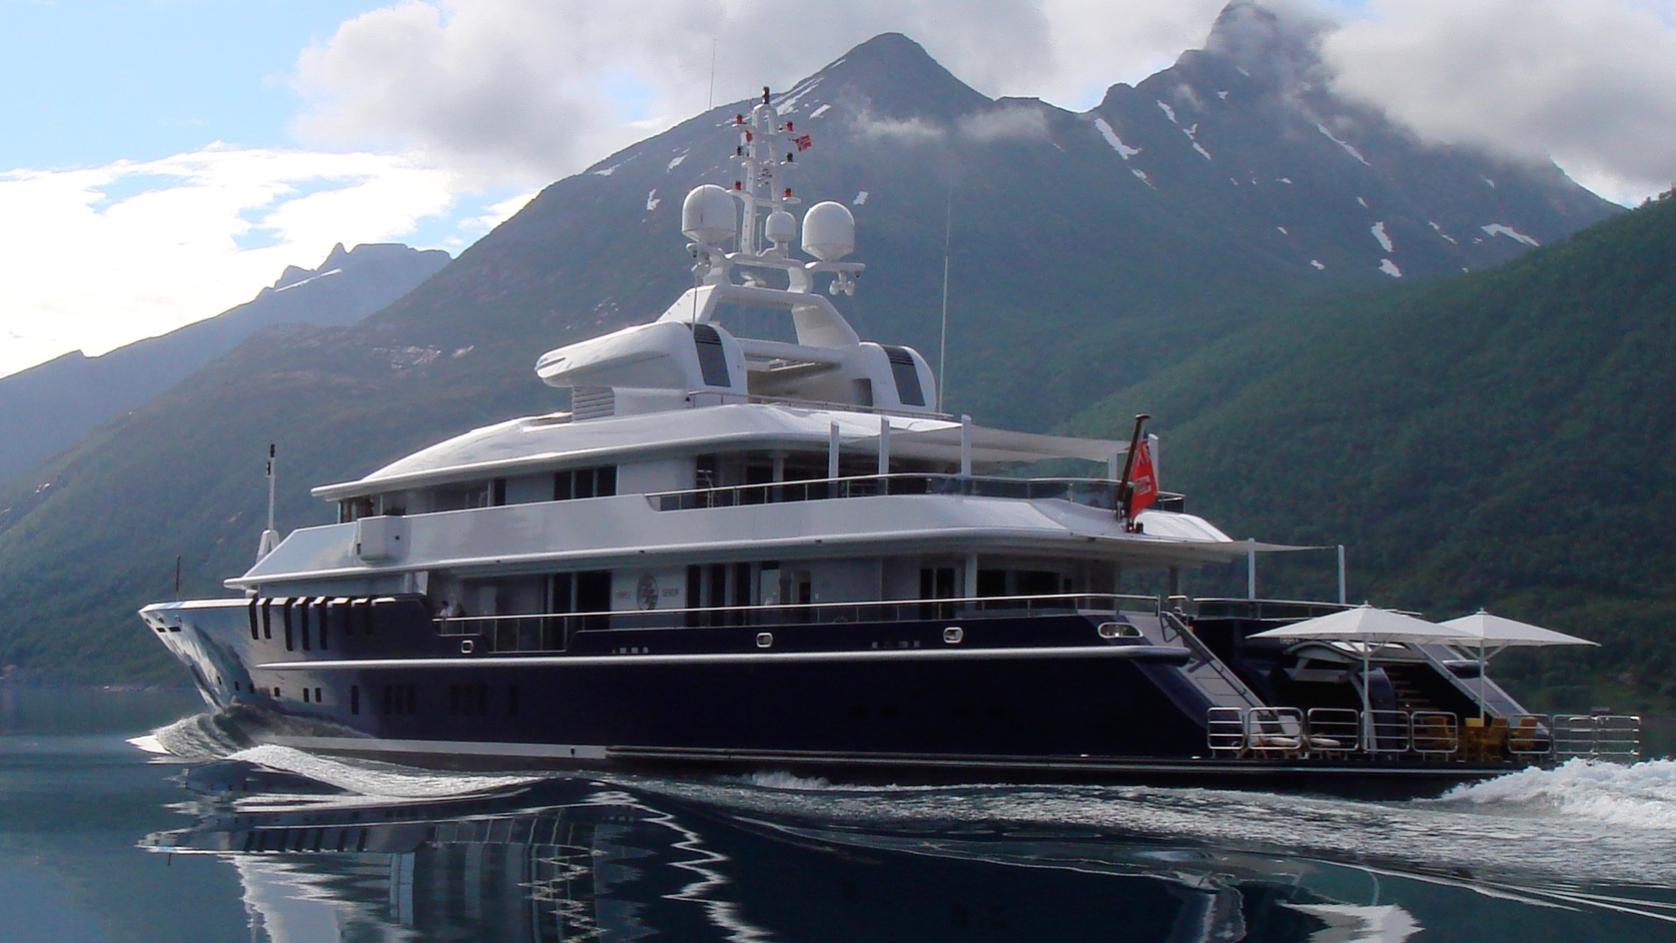 triple-seven-motor-yacht-nobiskrug-2006-68m-cruising-half-profile